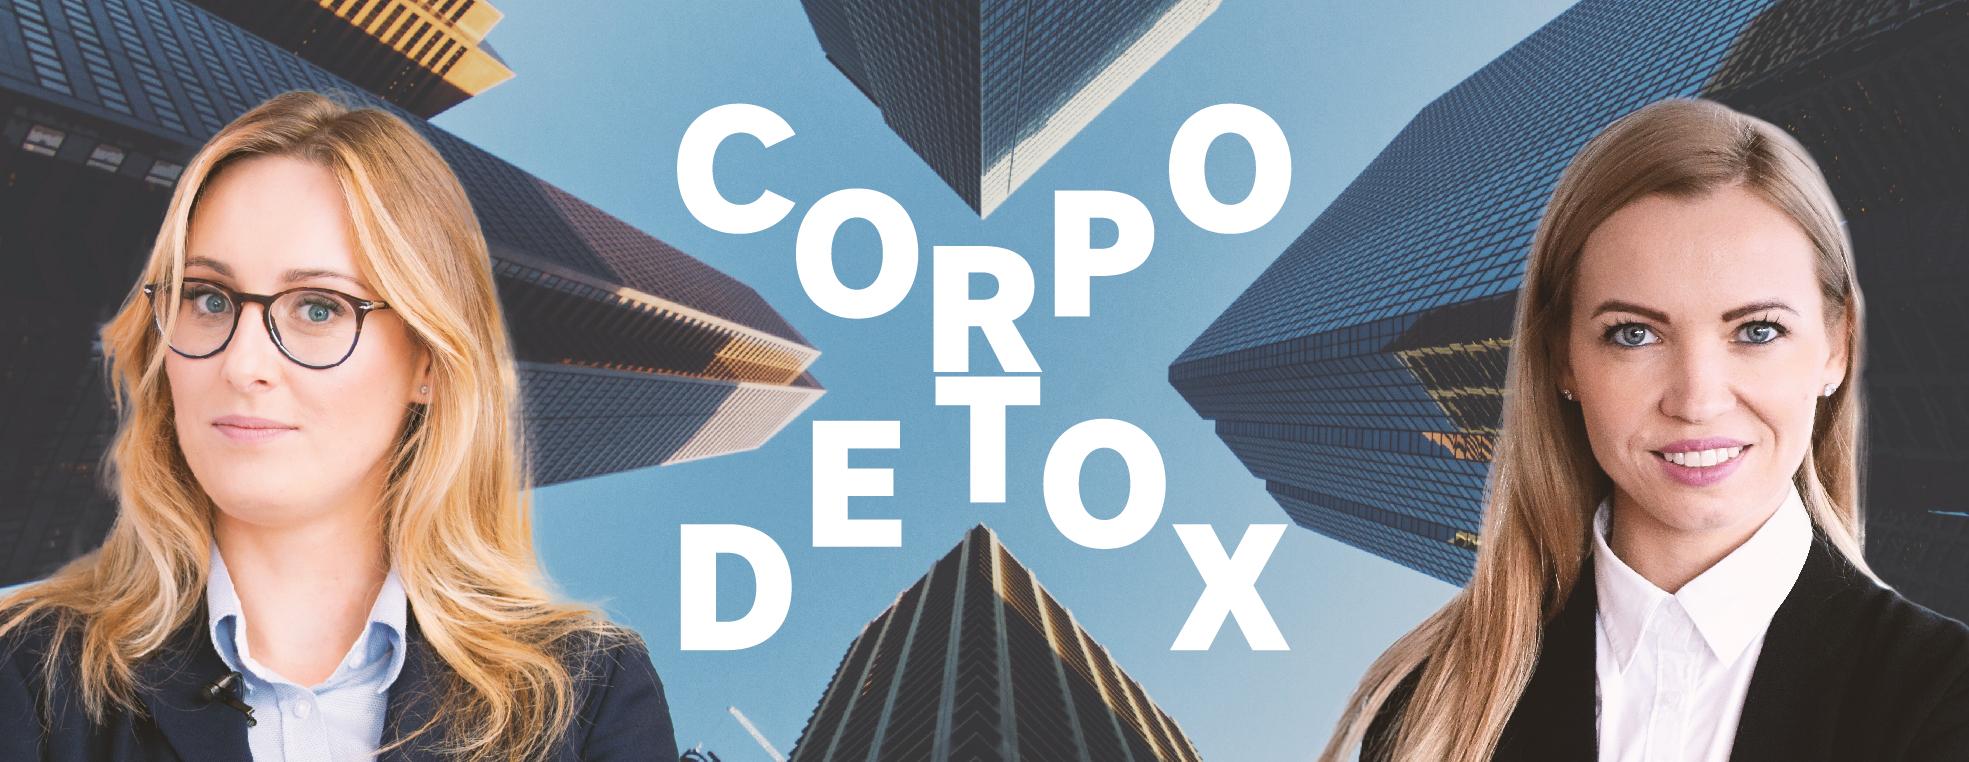 KorpoDetox